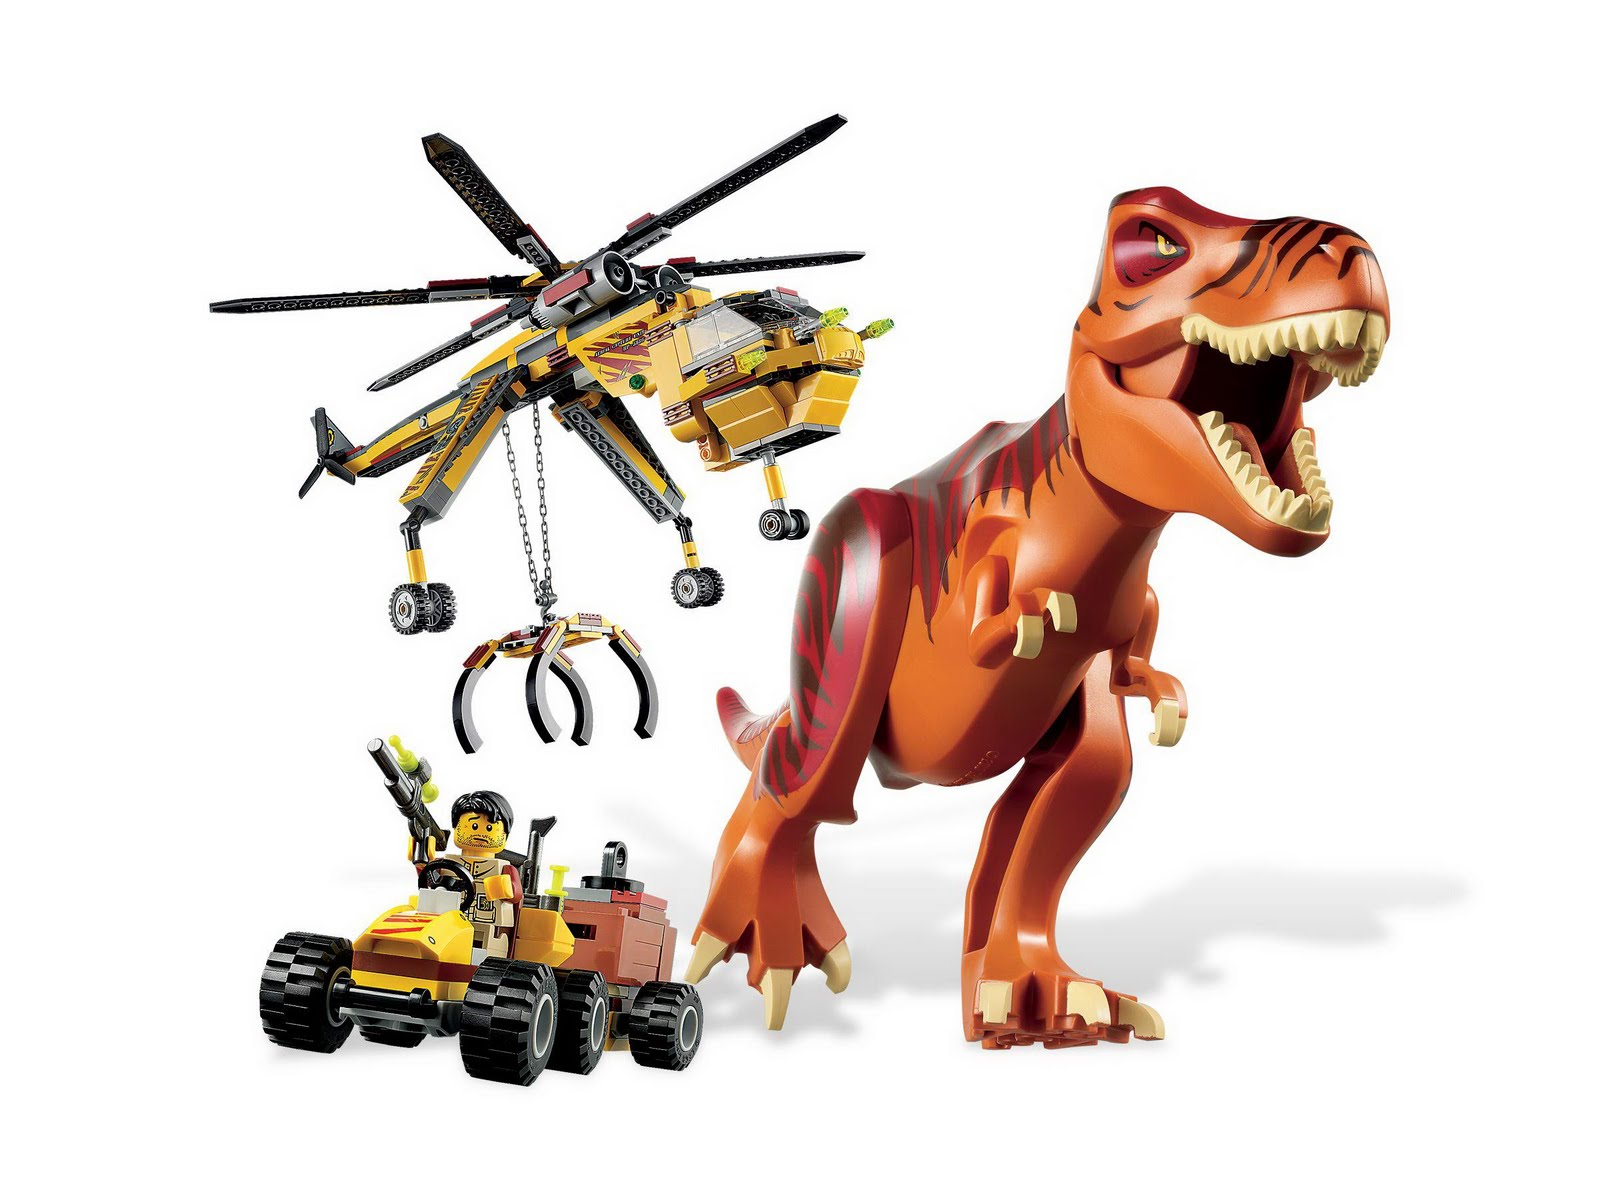 Repubblick set database lego 5886 t rex hunter - Lego dinosaures ...